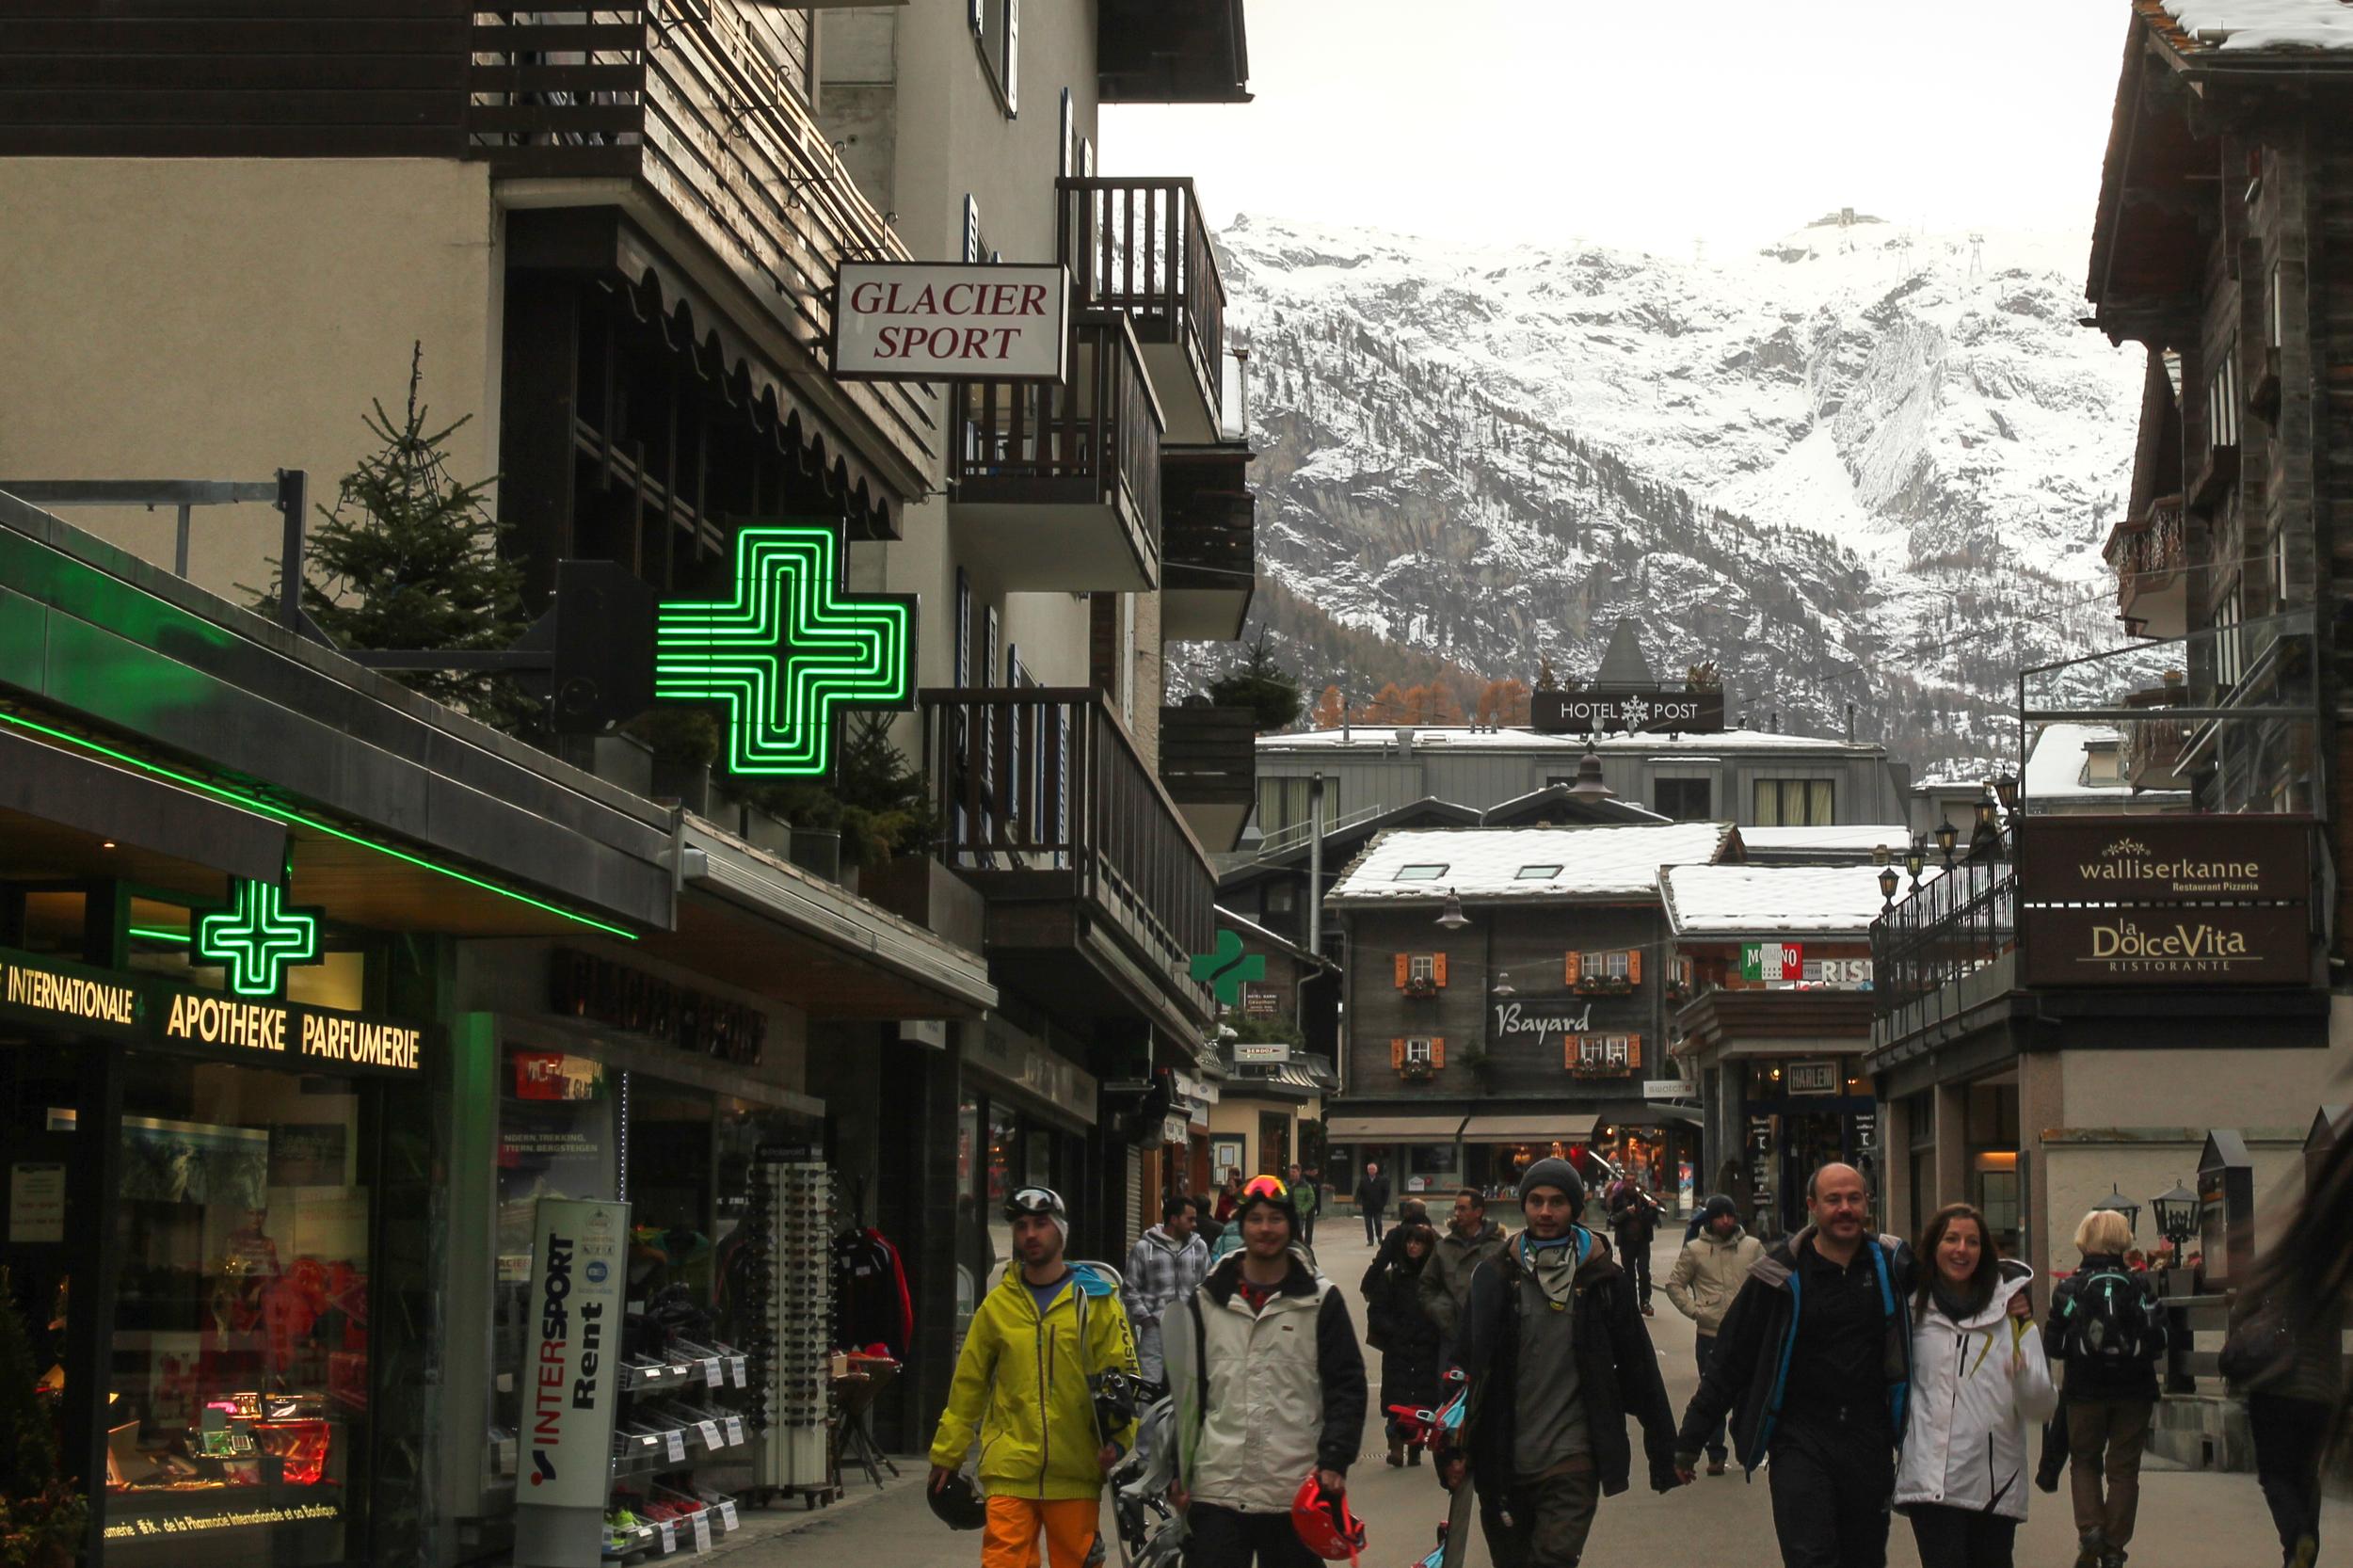 Zermatt Travel Guide - Let's Go Bravo